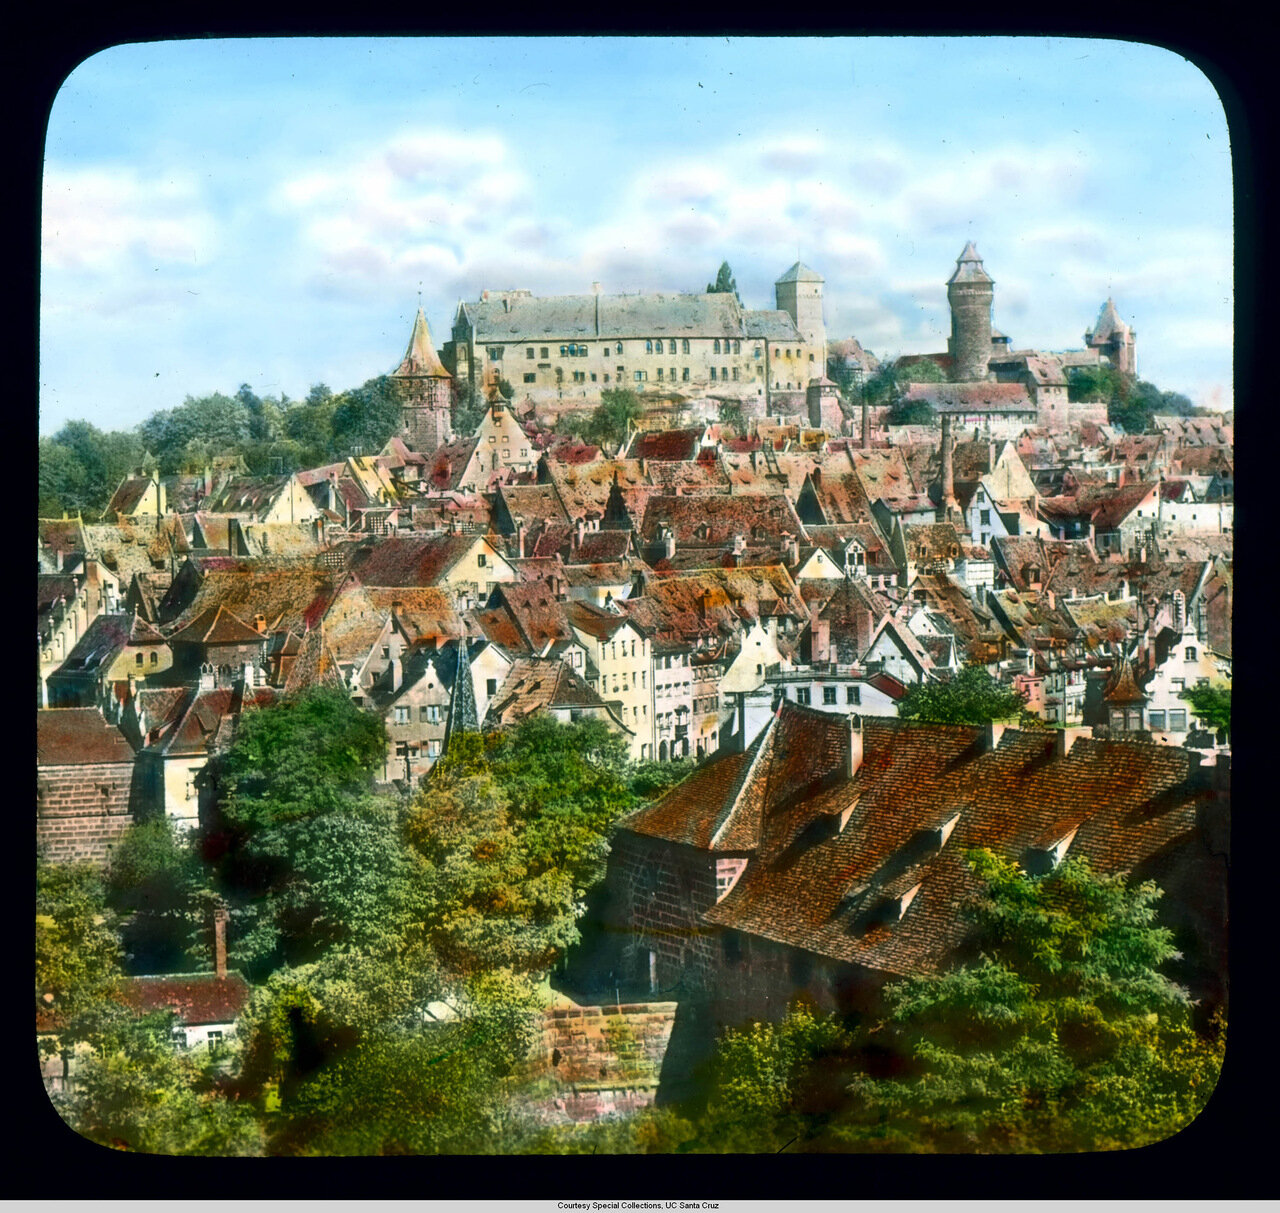 Нюрнберг. Вид старого города и замка